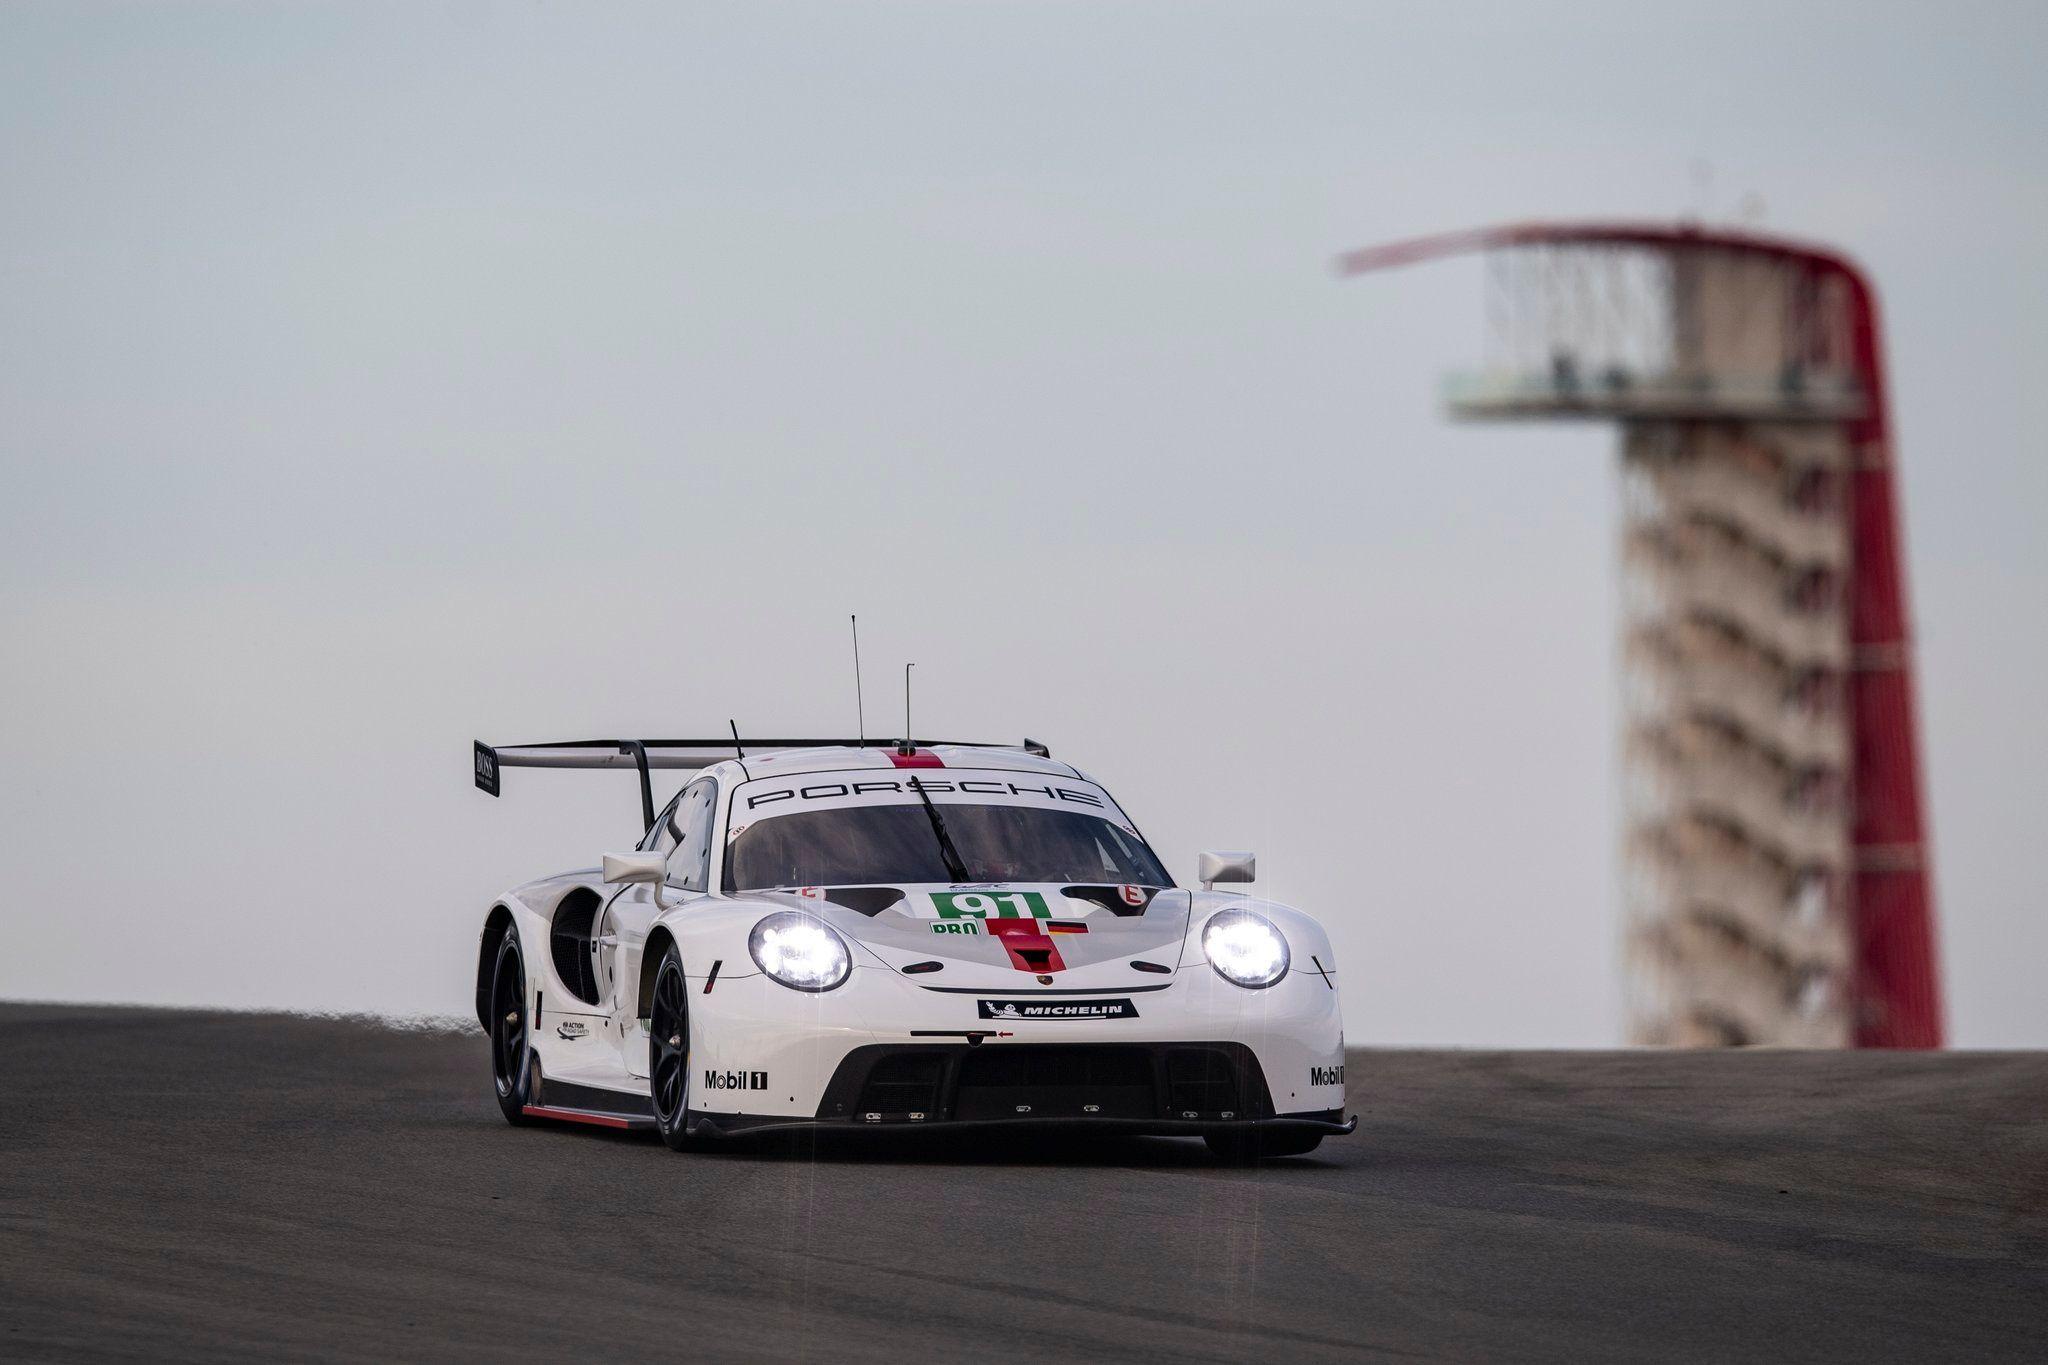 Porsche Motorsport On Twitter Porsche Motorsport Porsche Motorsport